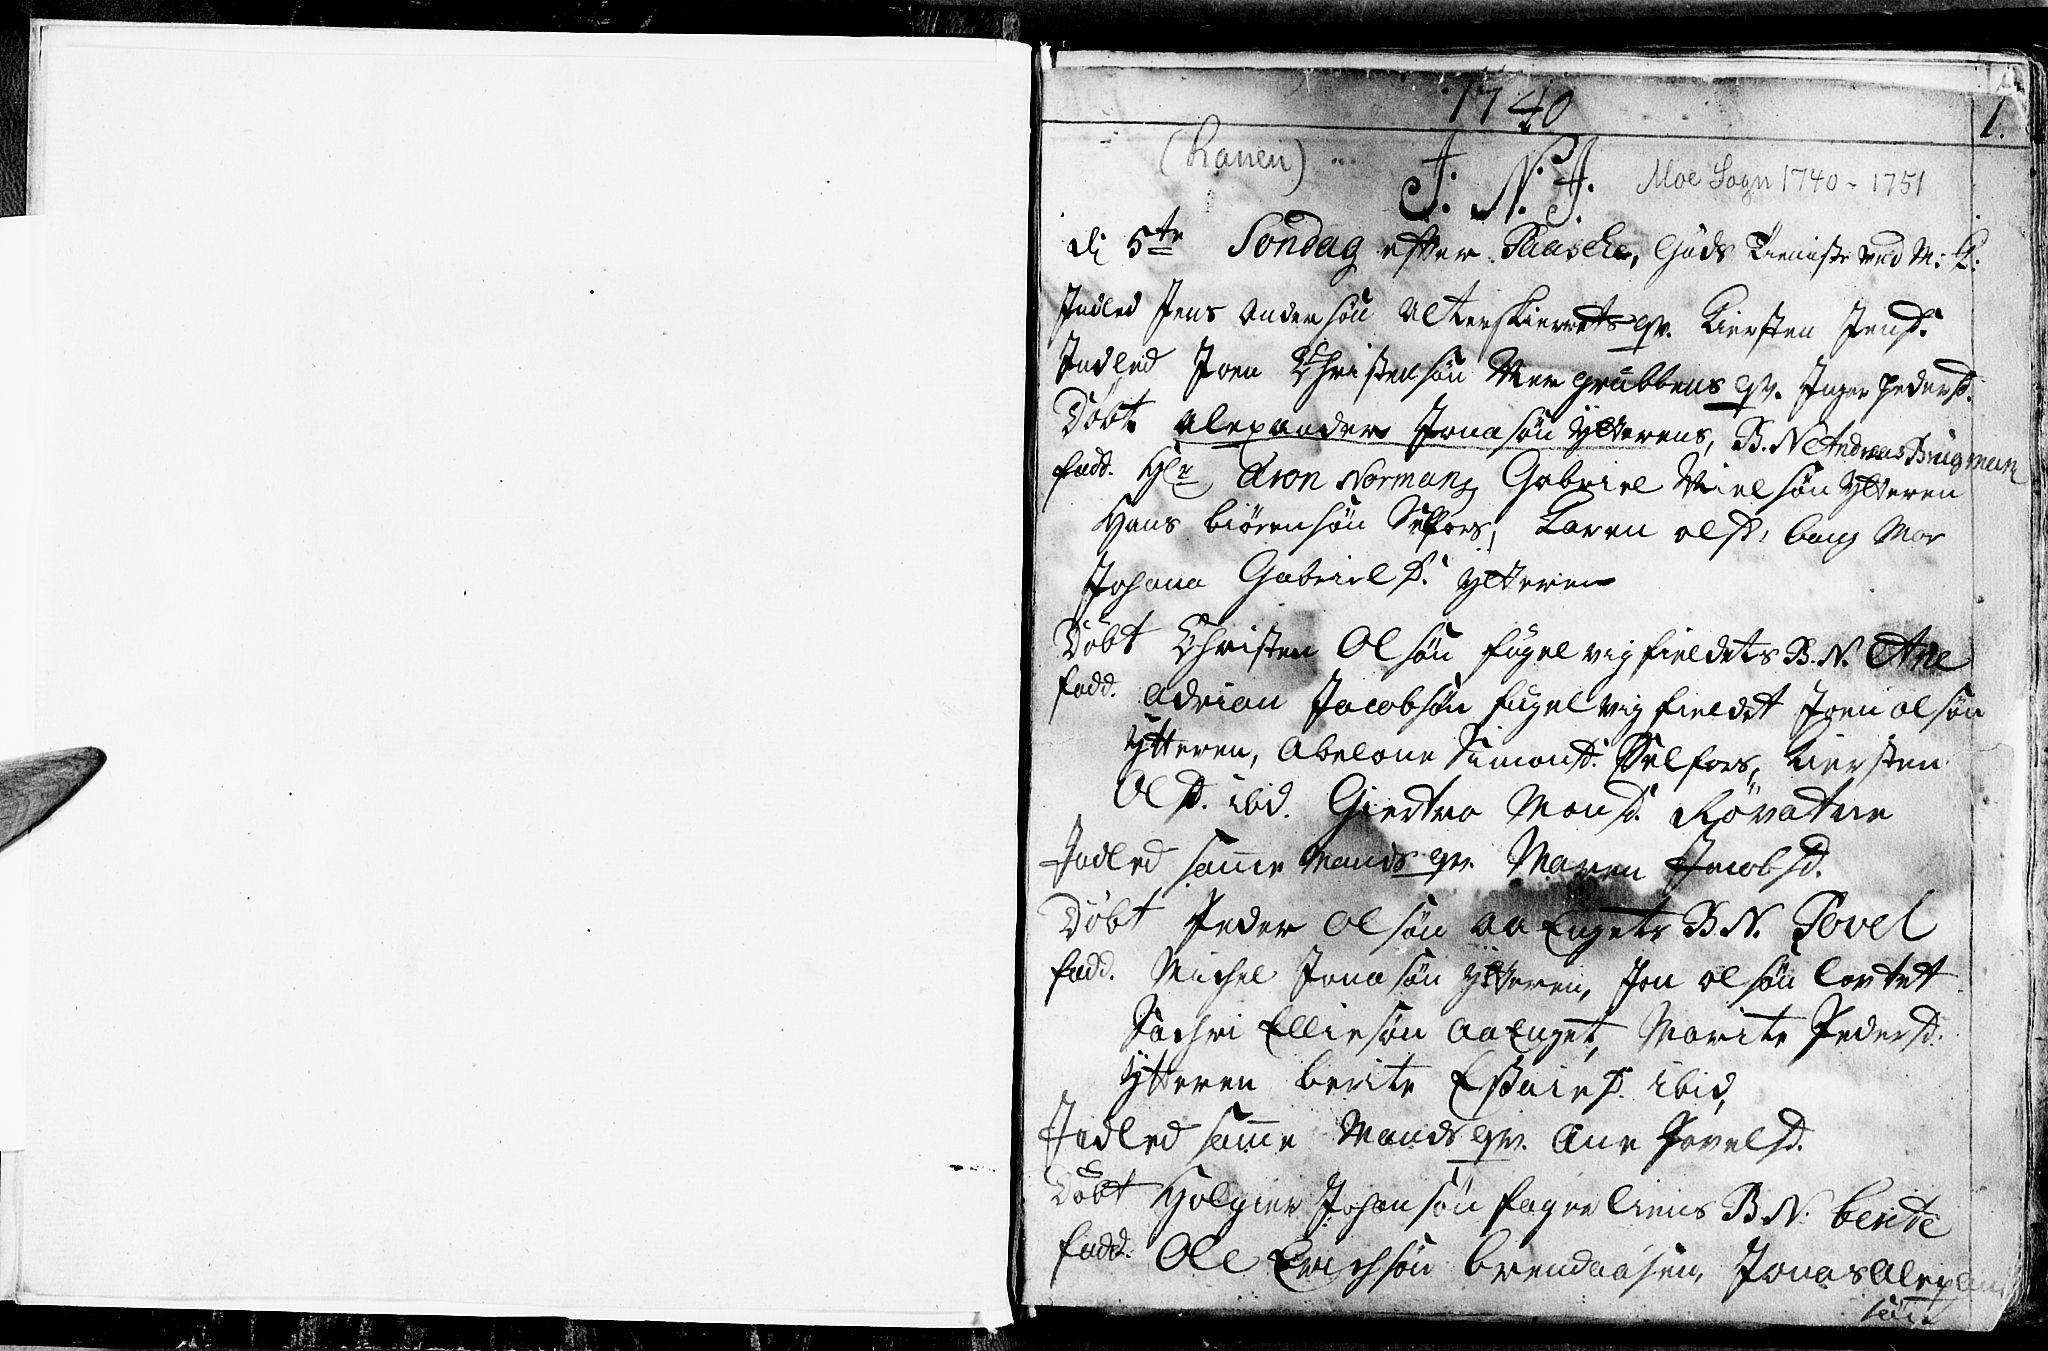 SAT, Ministerialprotokoller, klokkerbøker og fødselsregistre - Nordland, 827/L0389: Ministerialbok nr. 827A01, 1740-1751, s. 0-1